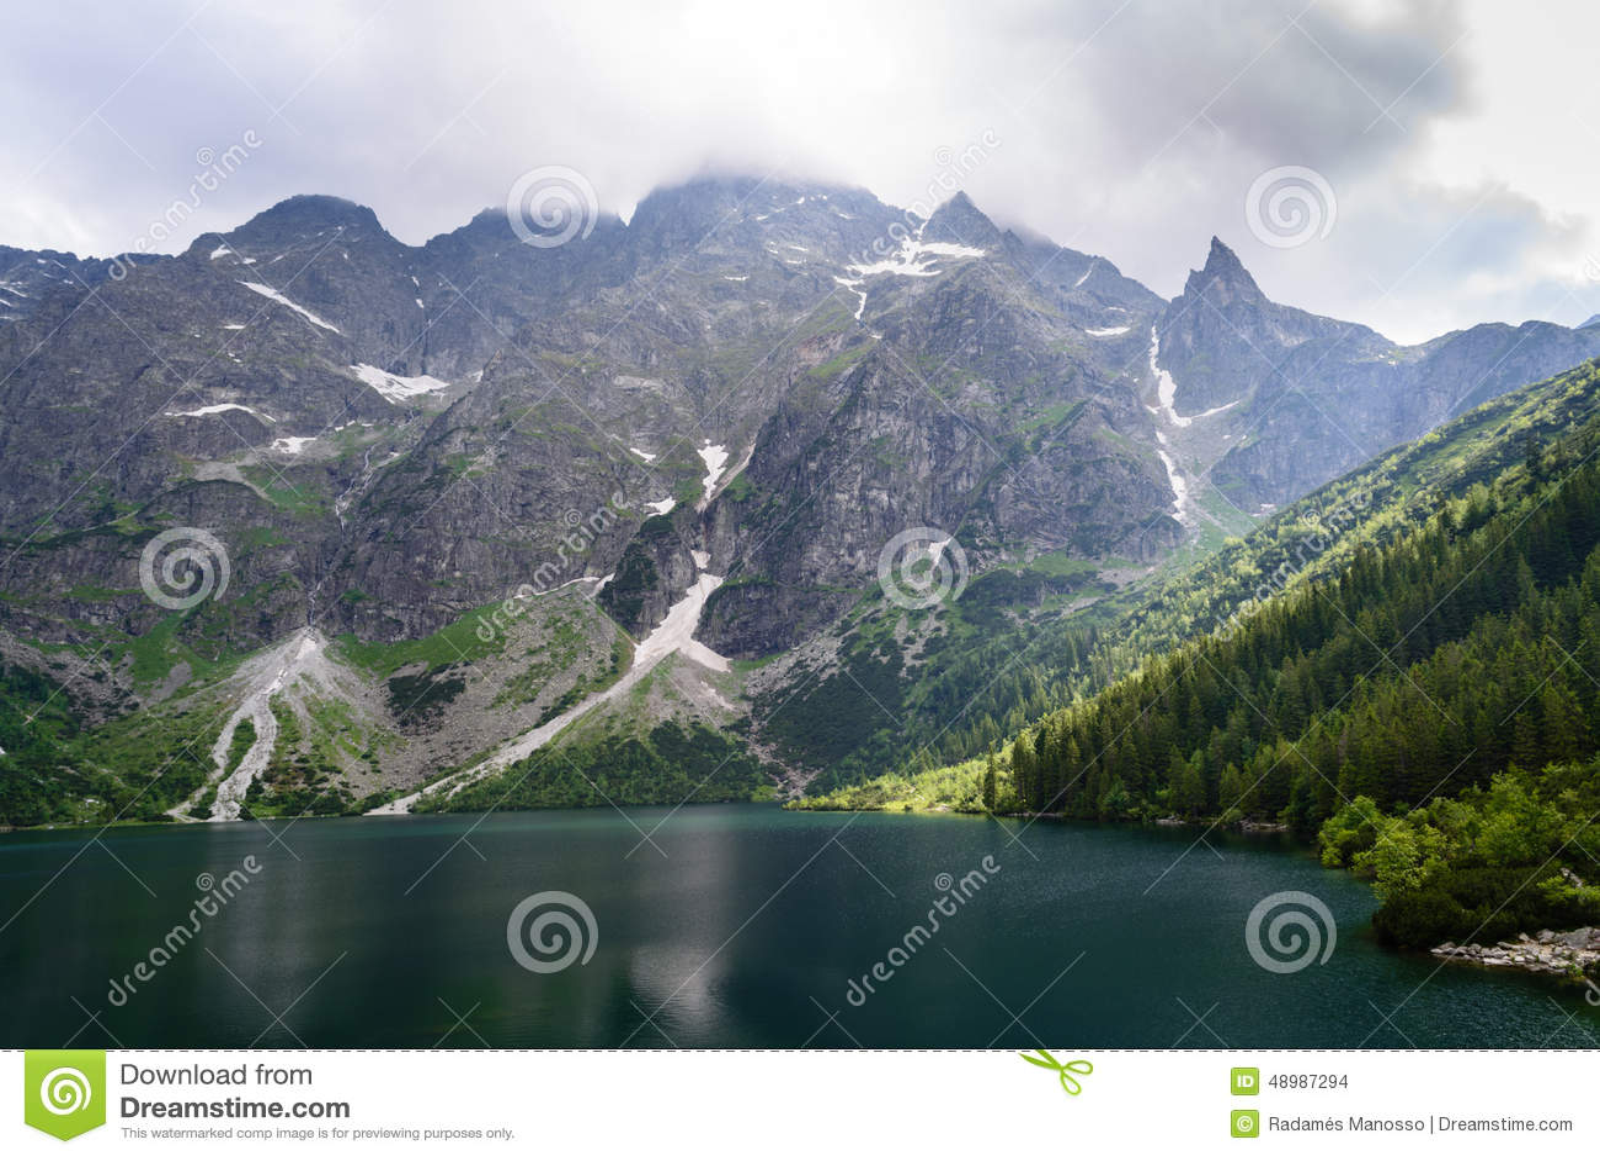 Lake Morskie Oko at Tatra National Park